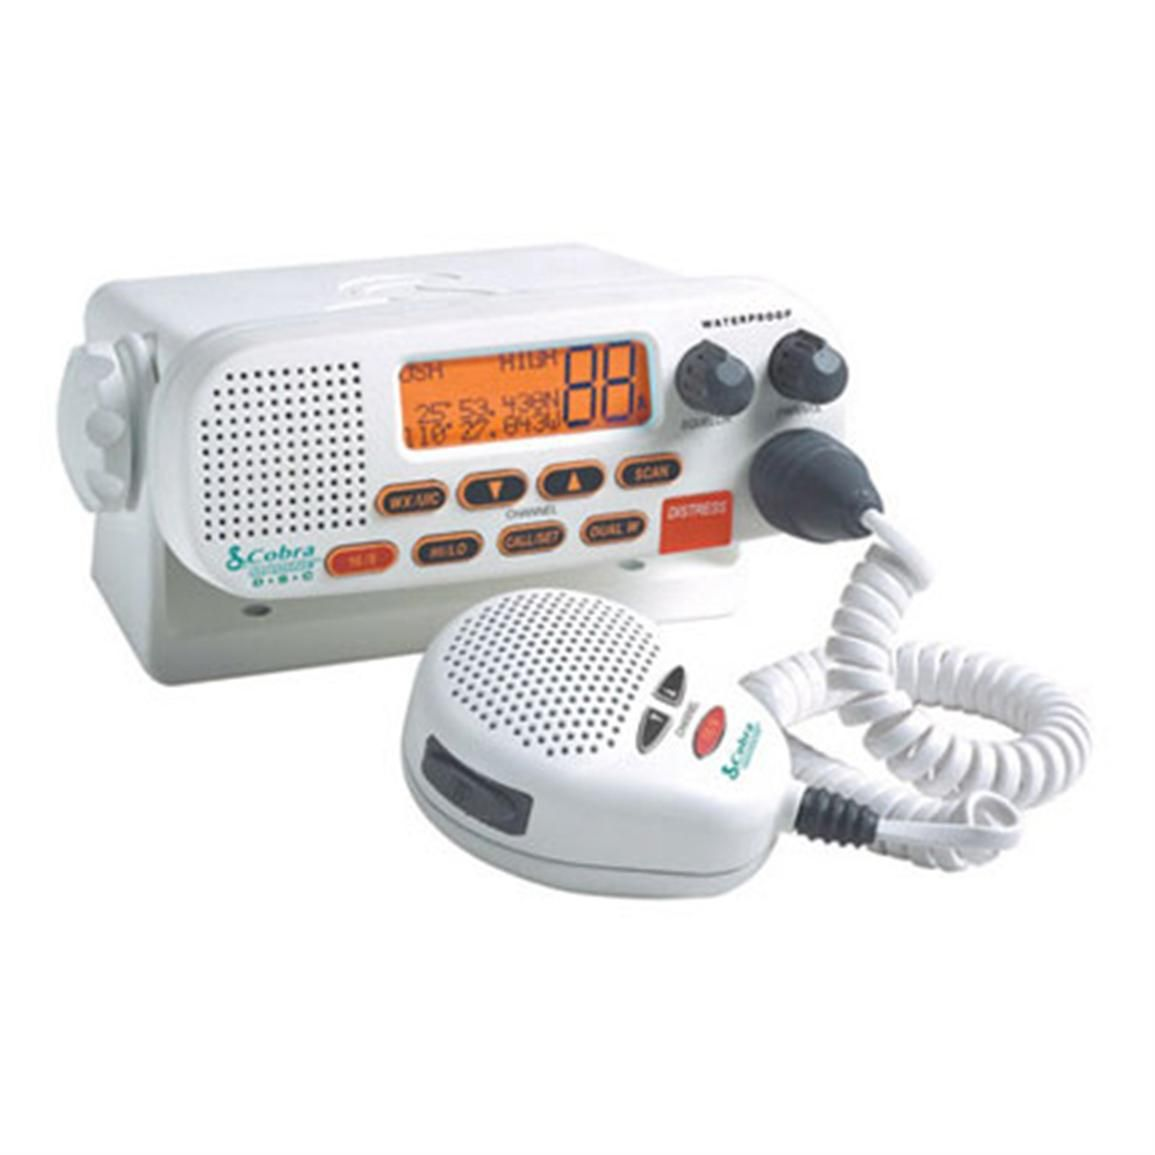 Cobra Marine Mrf45 Vhf Radio Radio Cobra Marine Electronics